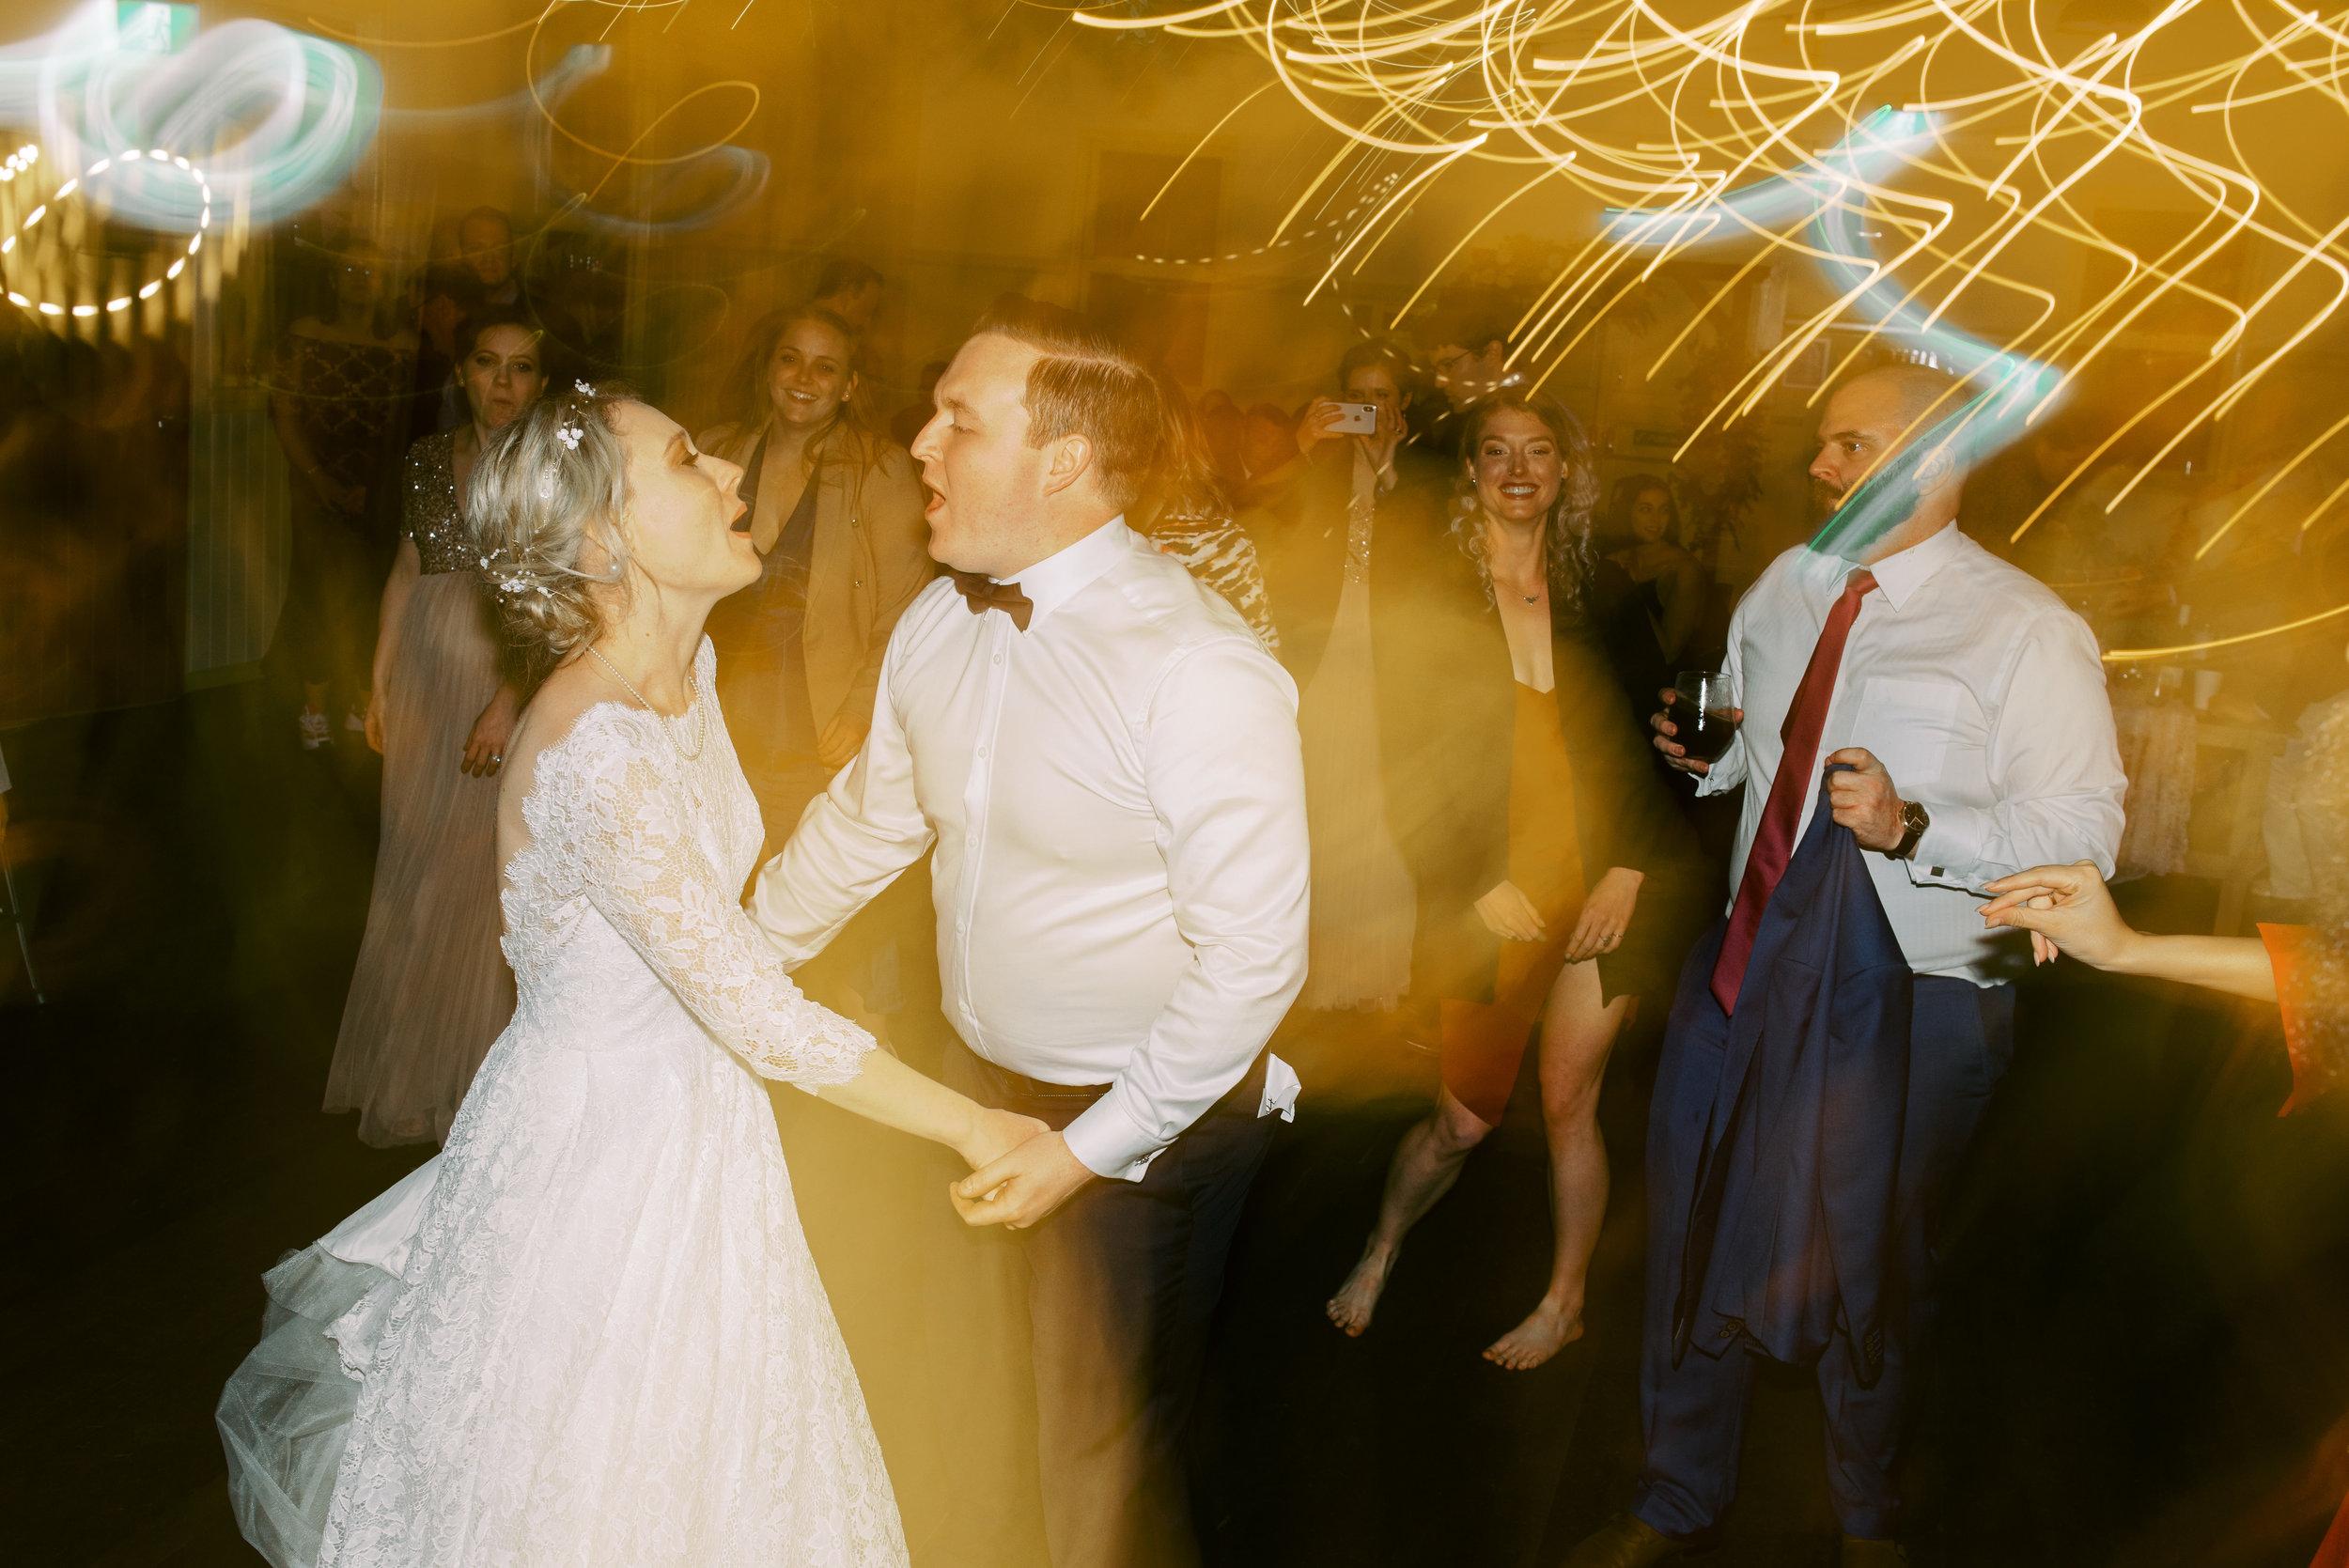 brisbane-gold-coast-sunshine-coast-tweed-romantic-fine-art-wedding-photography-lauren-olivia-95.jpg